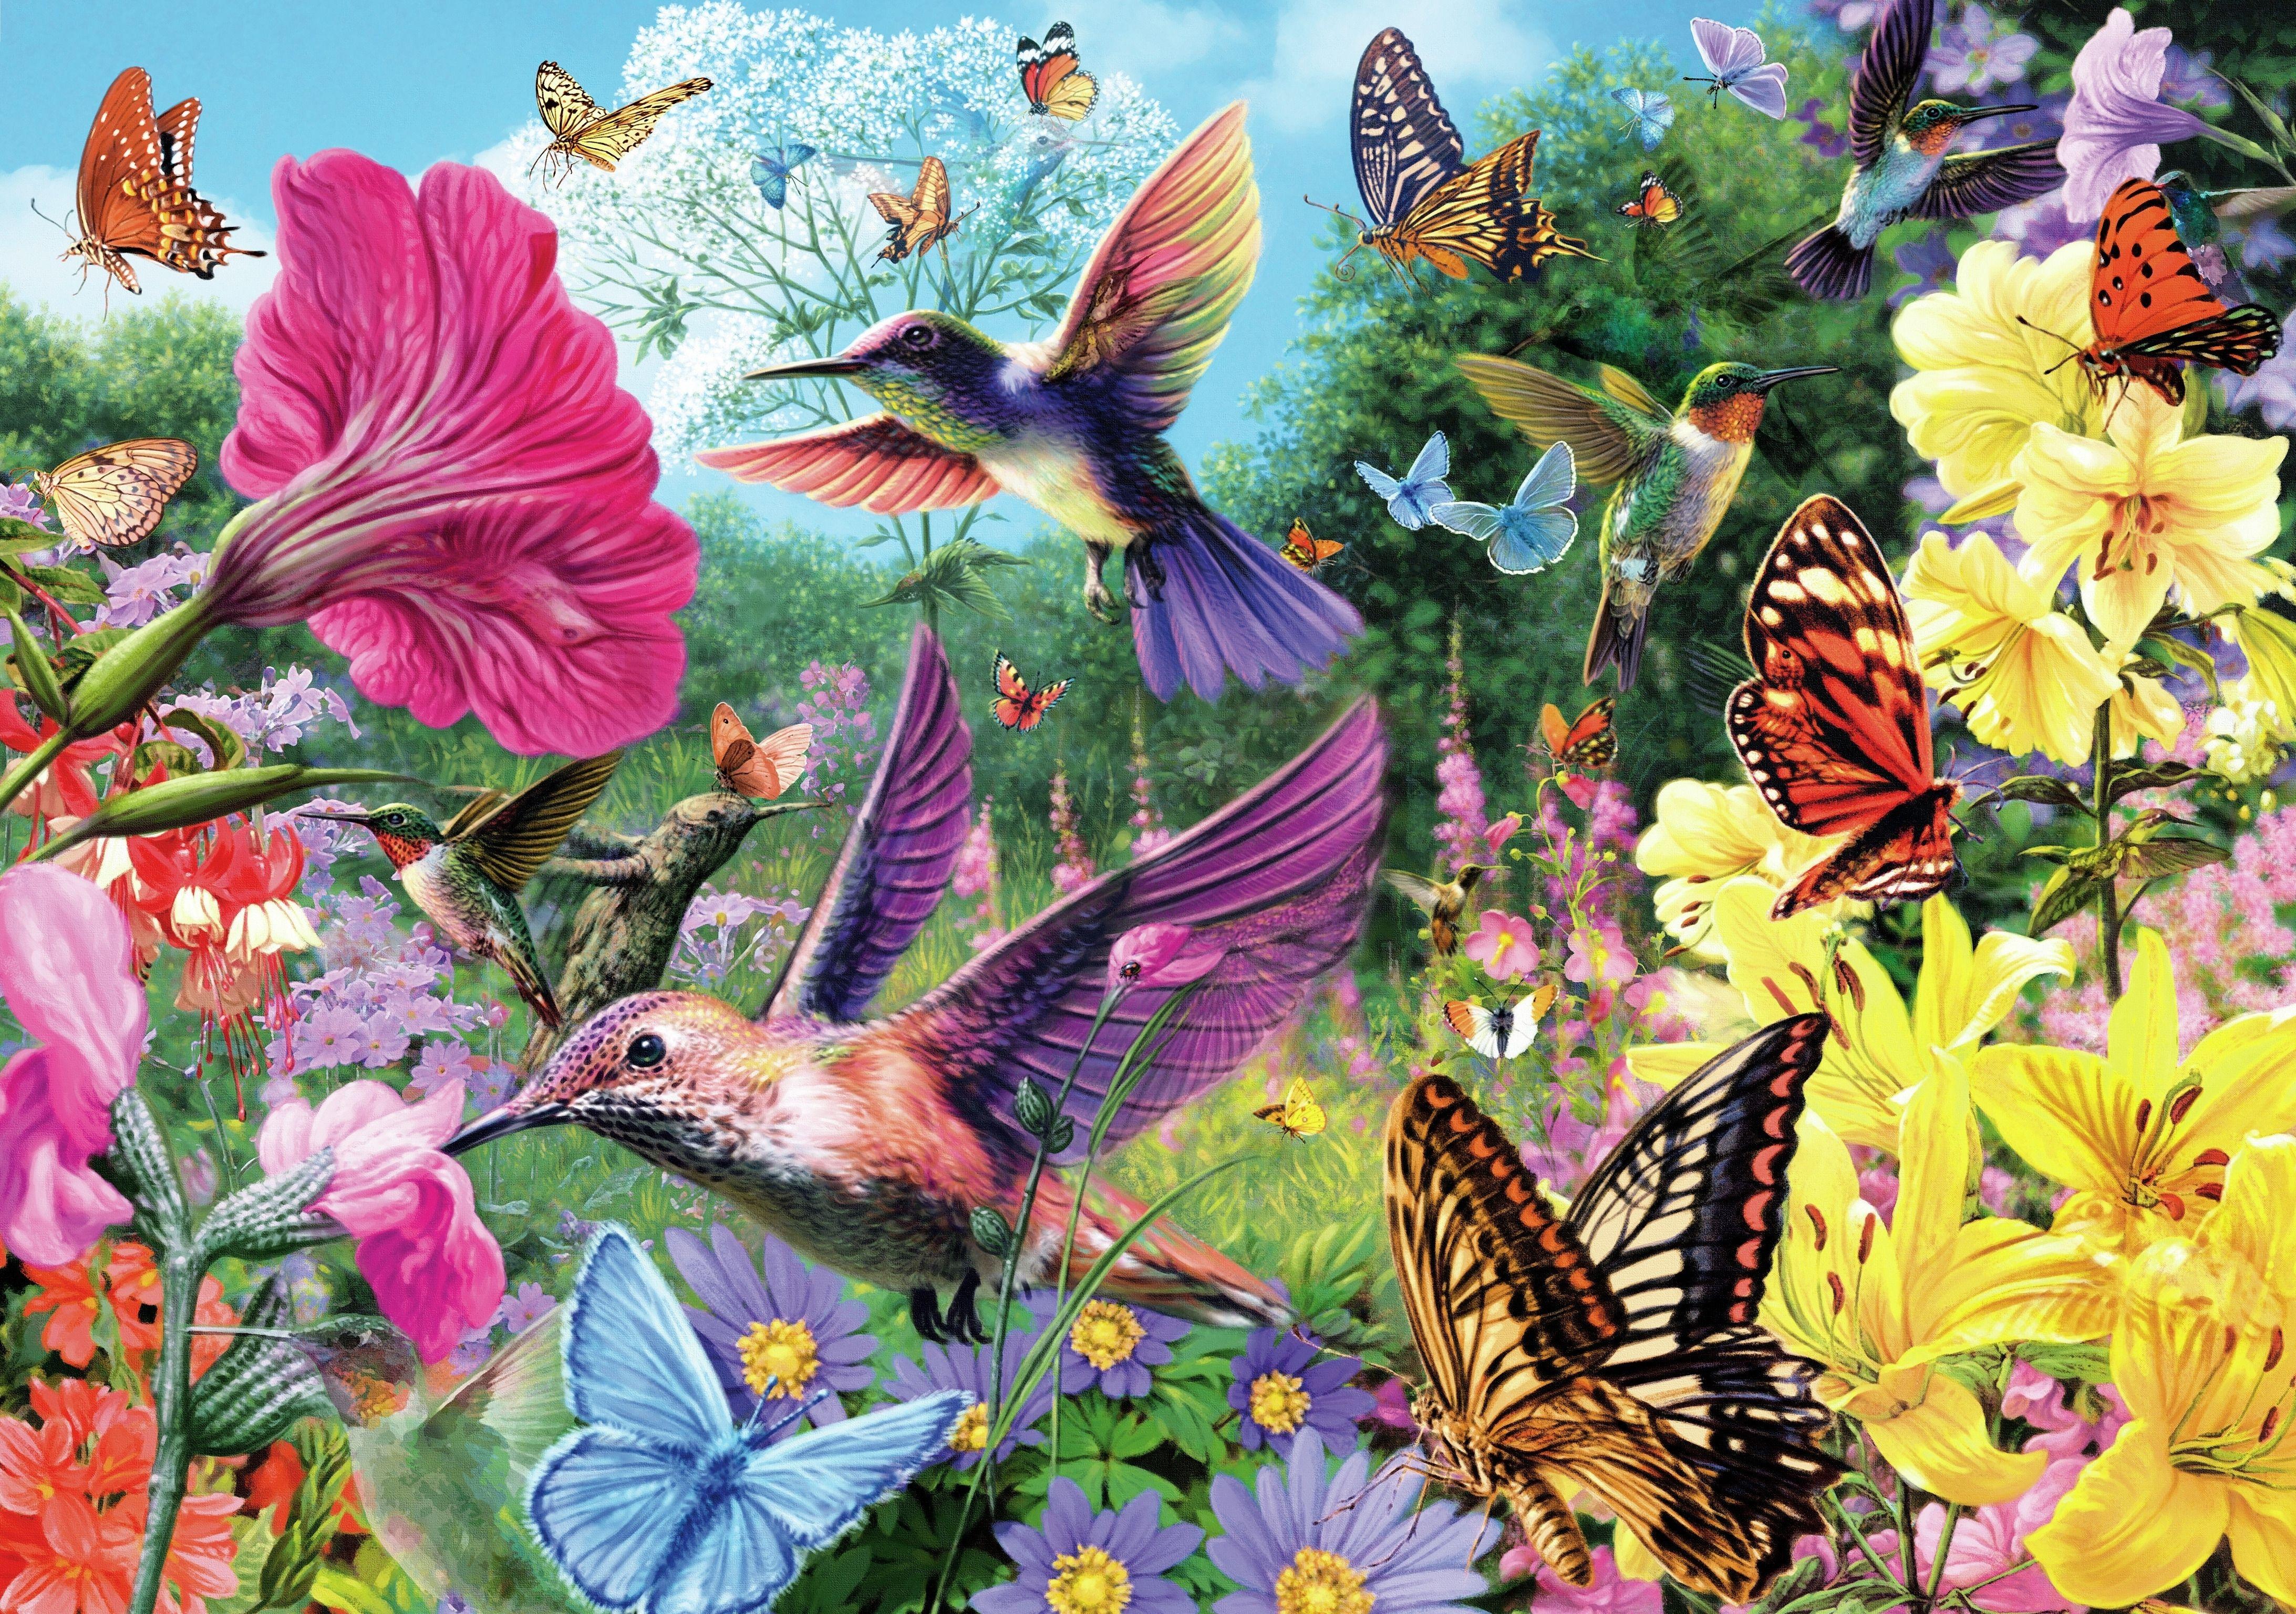 """Hummingbird Garden"" If you enjoy a bright, cheerful"